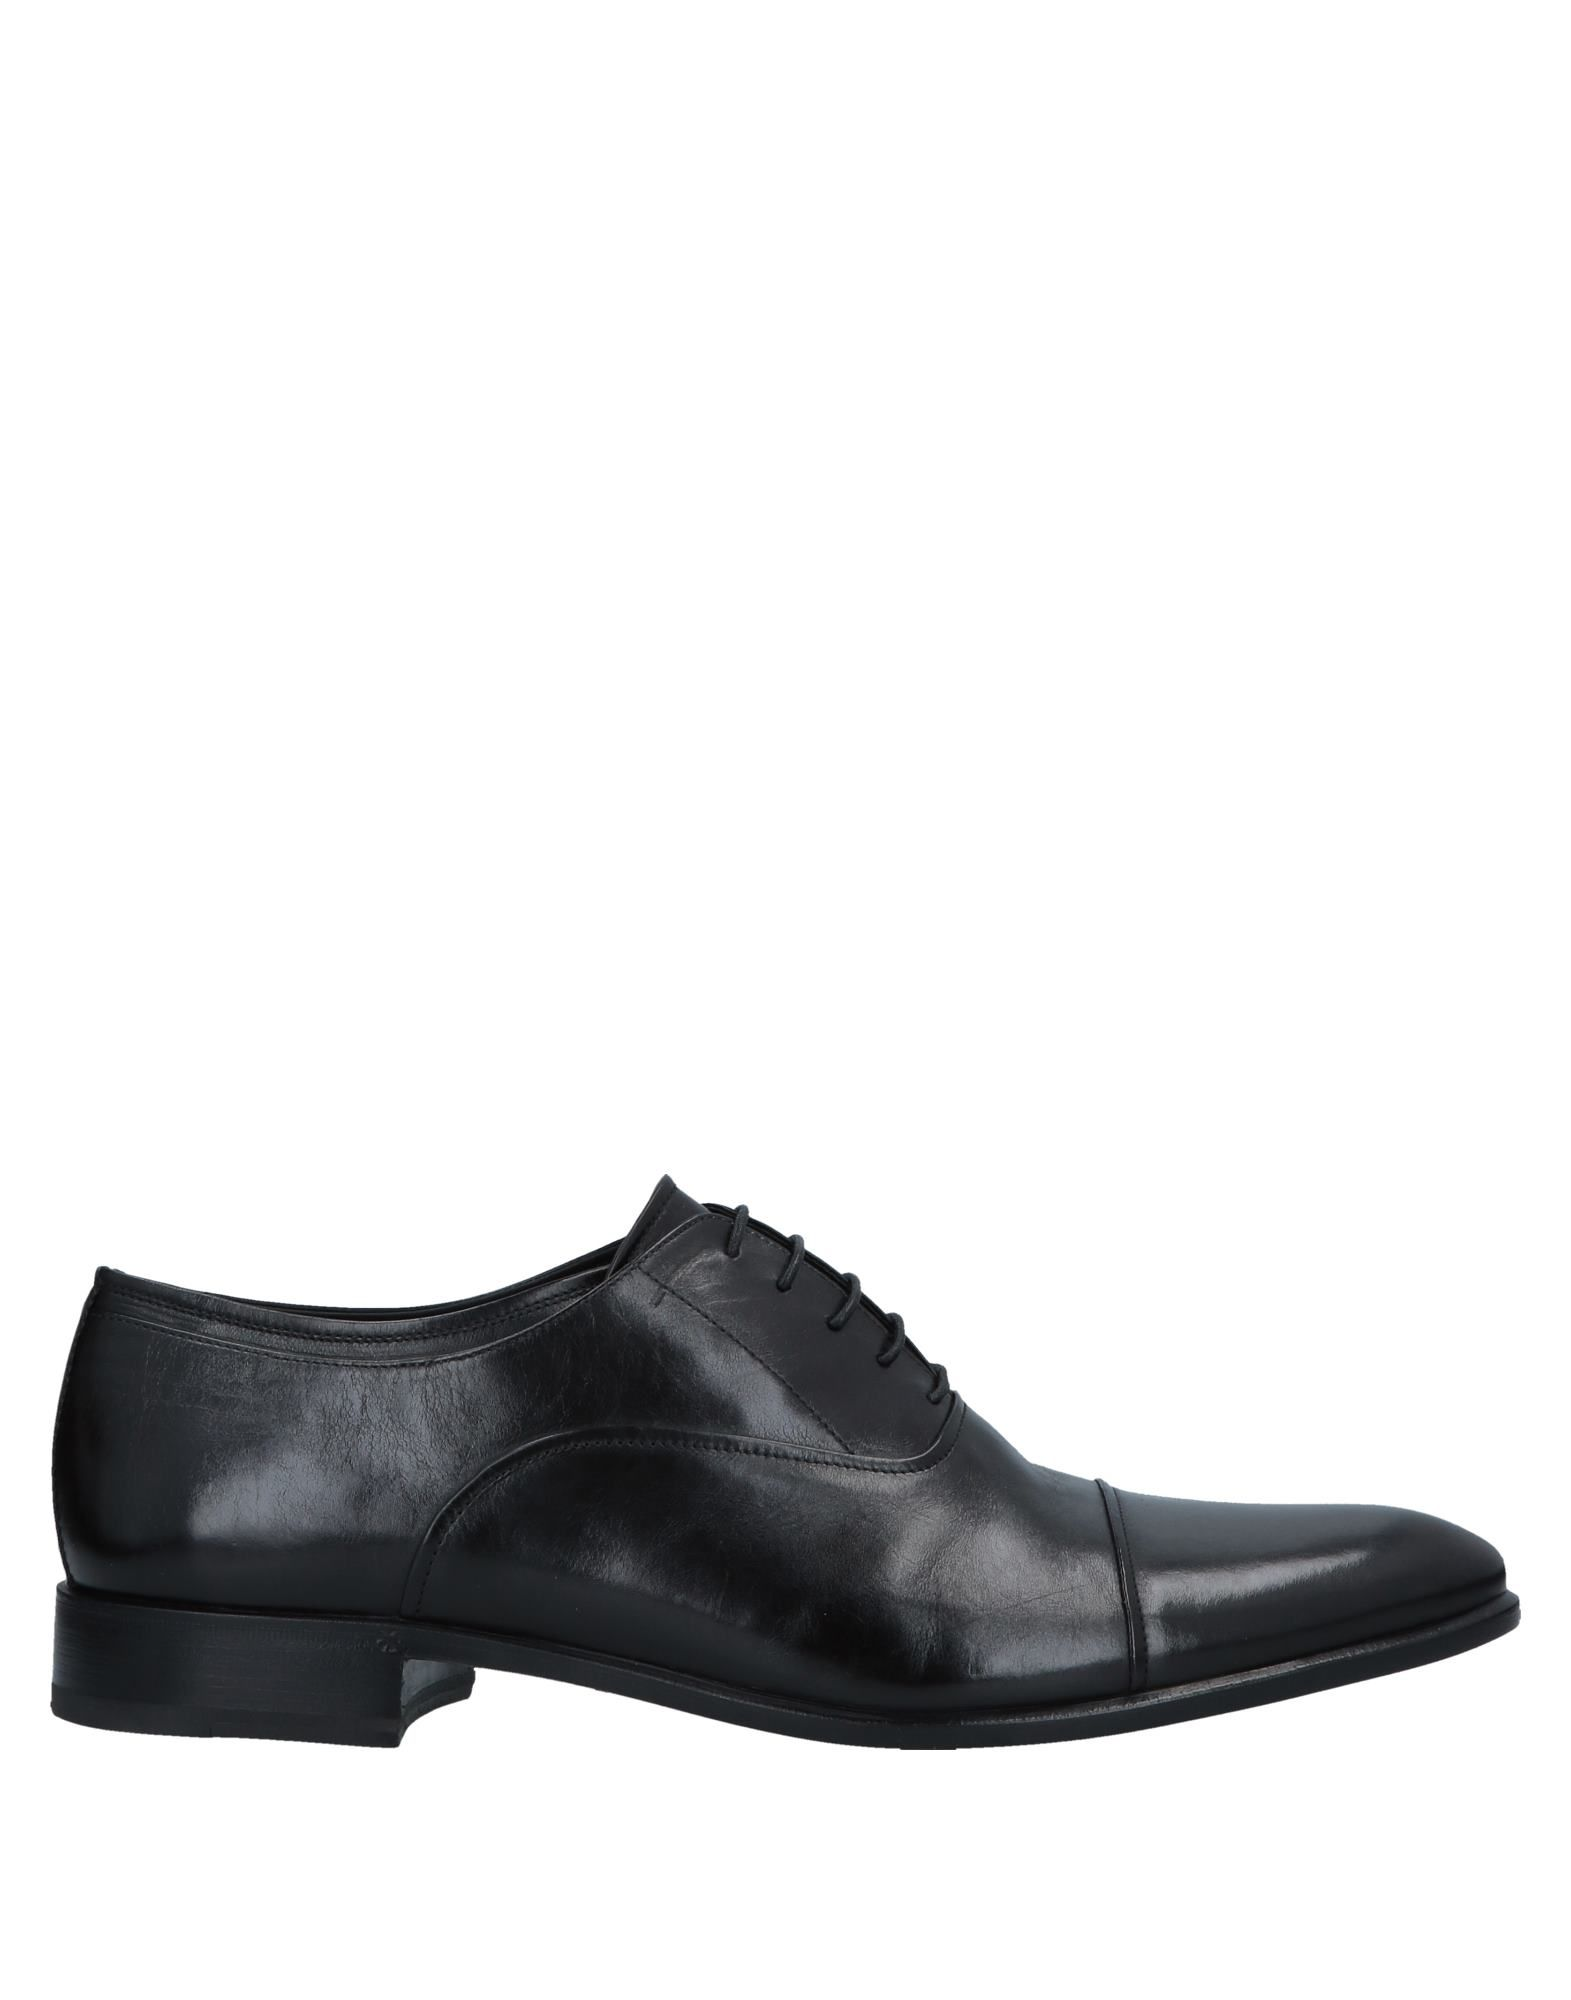 BRUNO ANTOLINI Обувь на шнурках цены онлайн